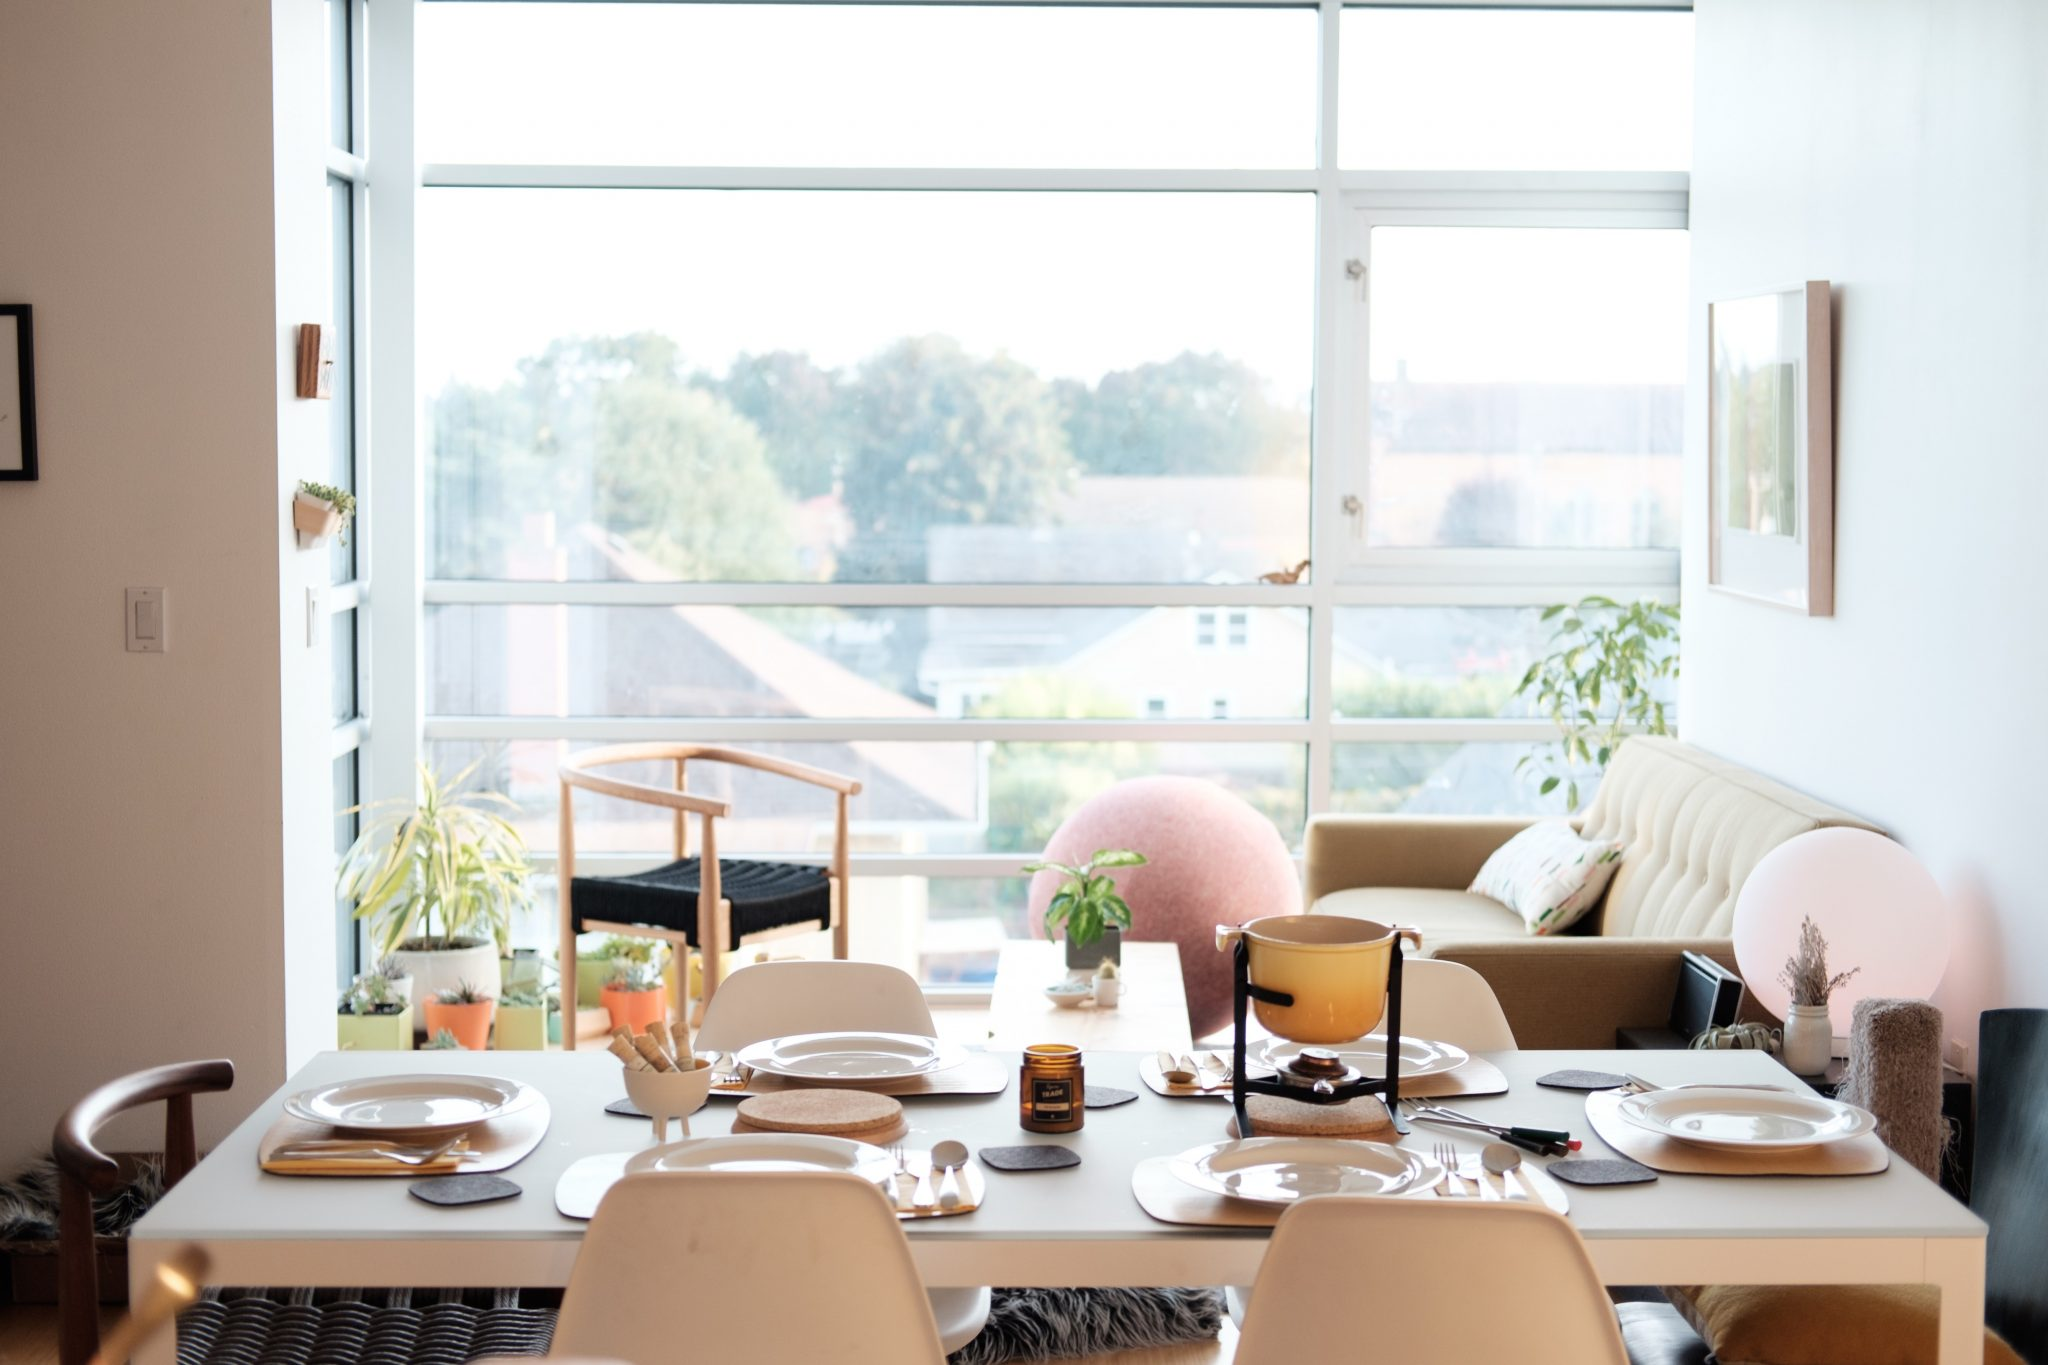 welche formen des m blierten wohnen gibt es homelike. Black Bedroom Furniture Sets. Home Design Ideas